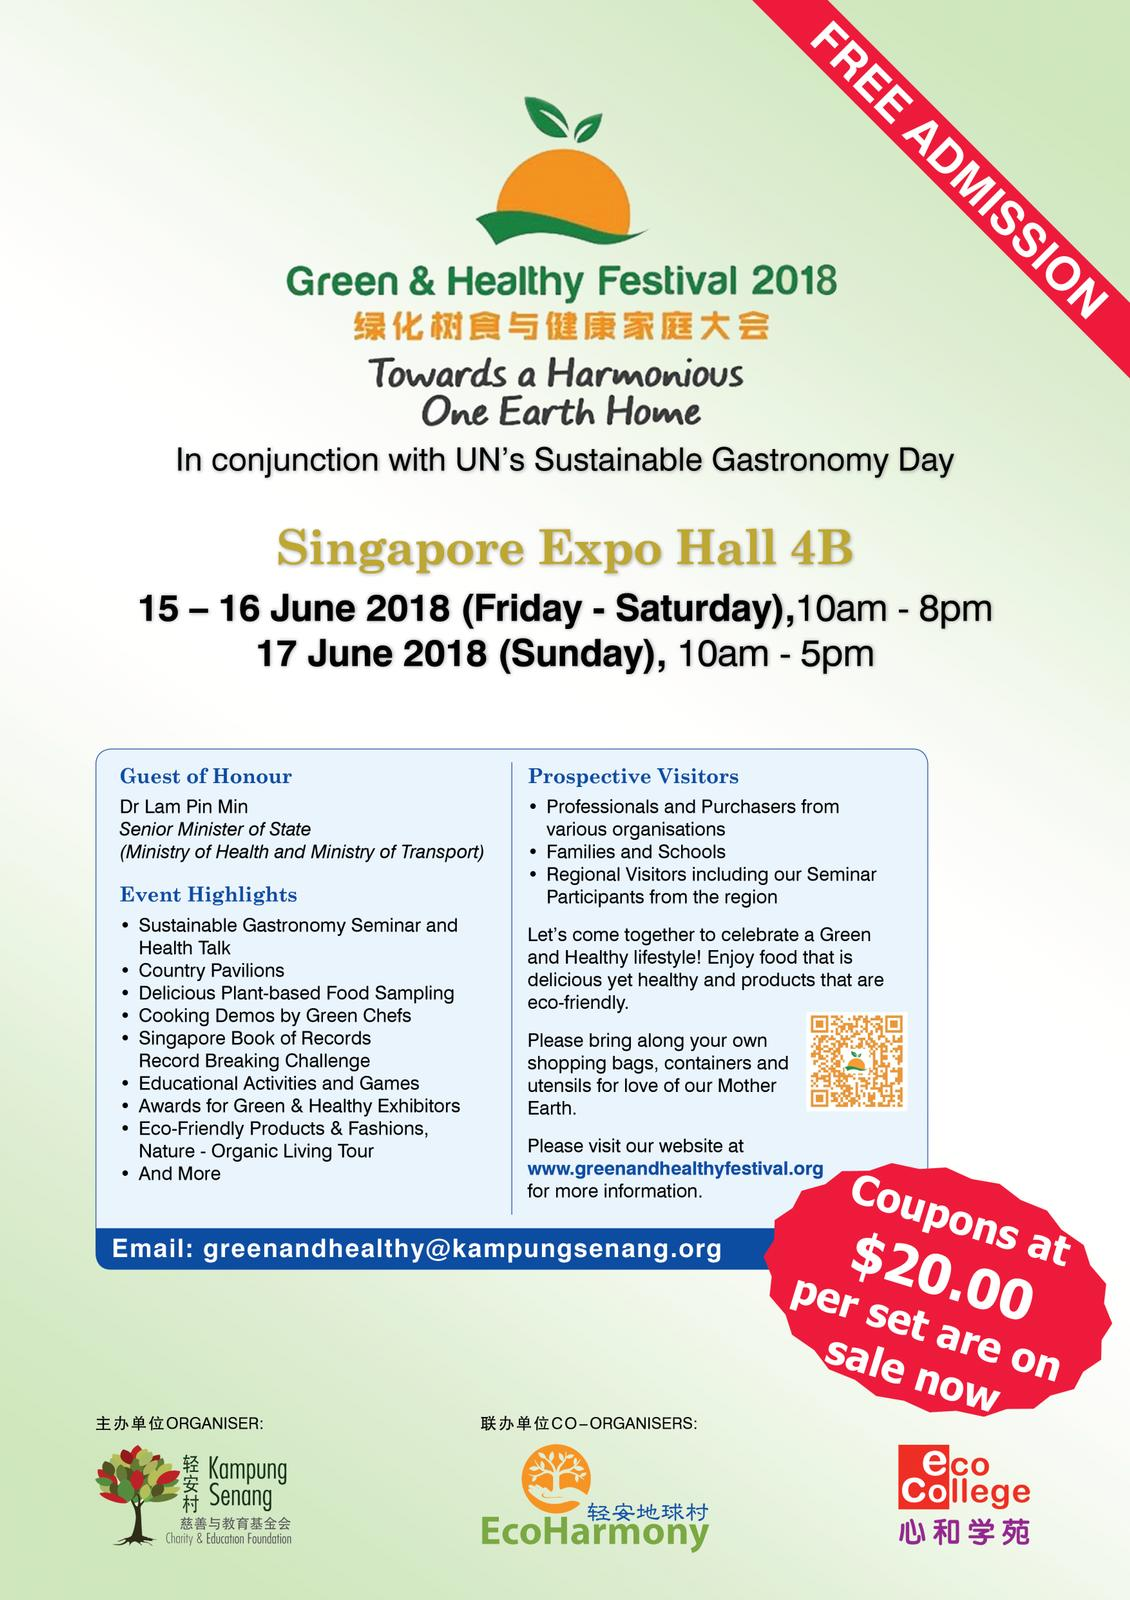 GREEN & HEALTHY FESTIVAL 2018